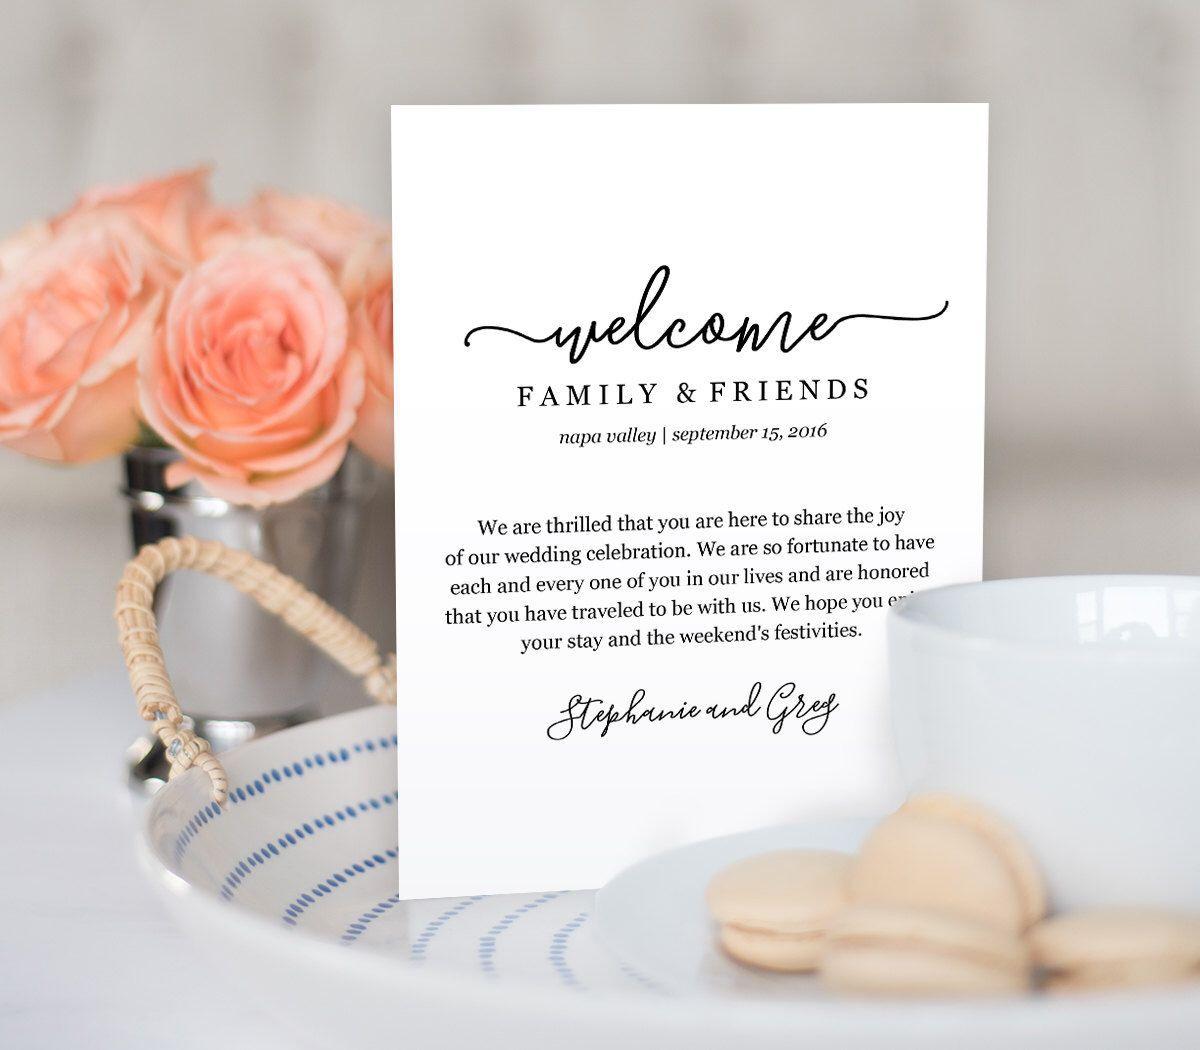 002 Sensational Wedding Welcome Bag Letter Template Free Concept Full